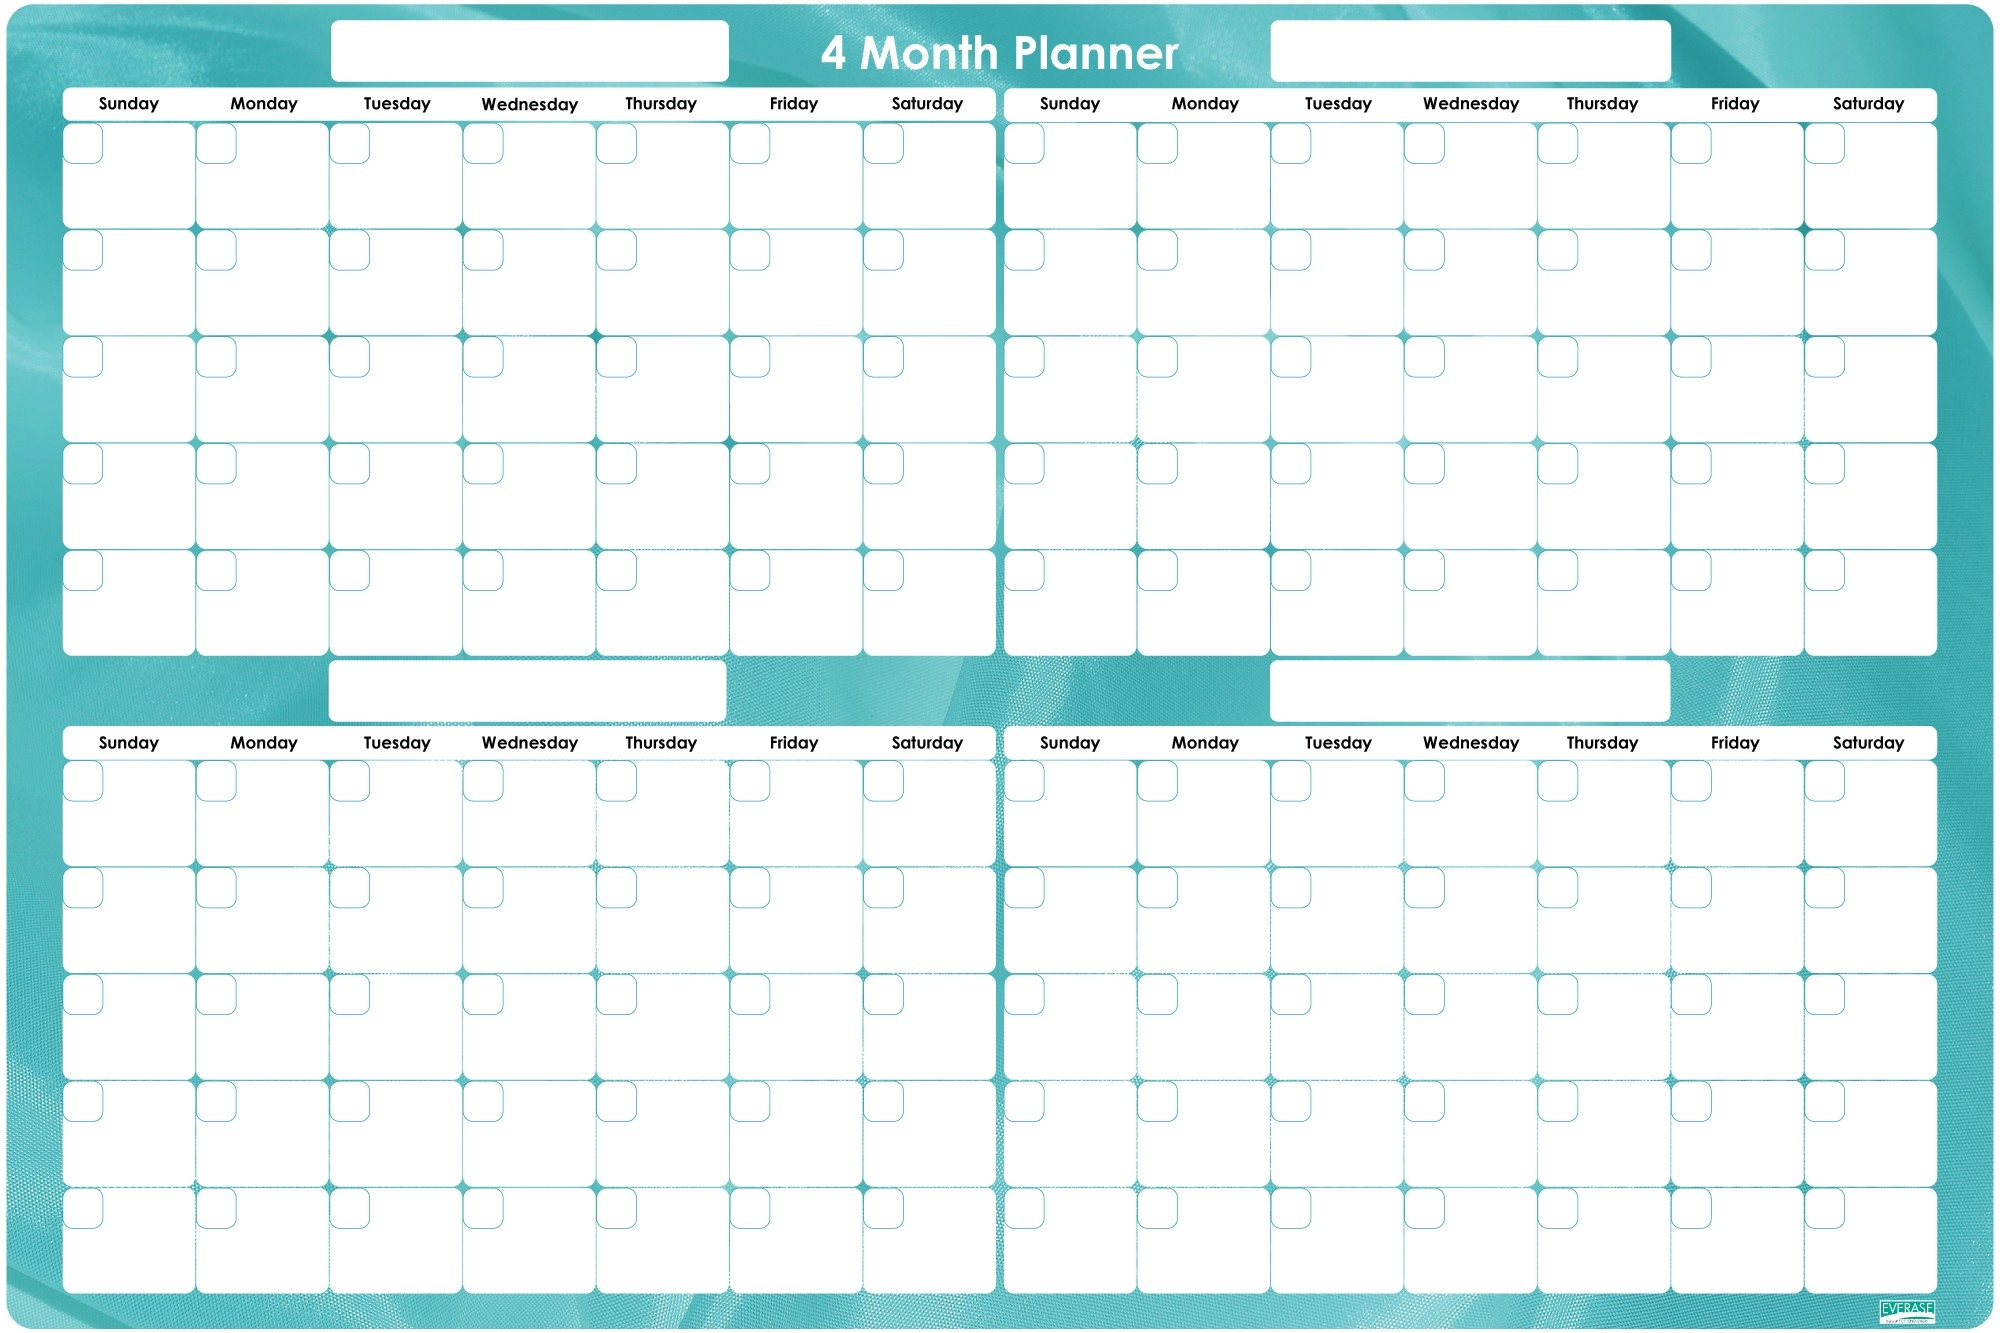 Month Planner - Parfu.kaptanband.co-4 Month Planner Template